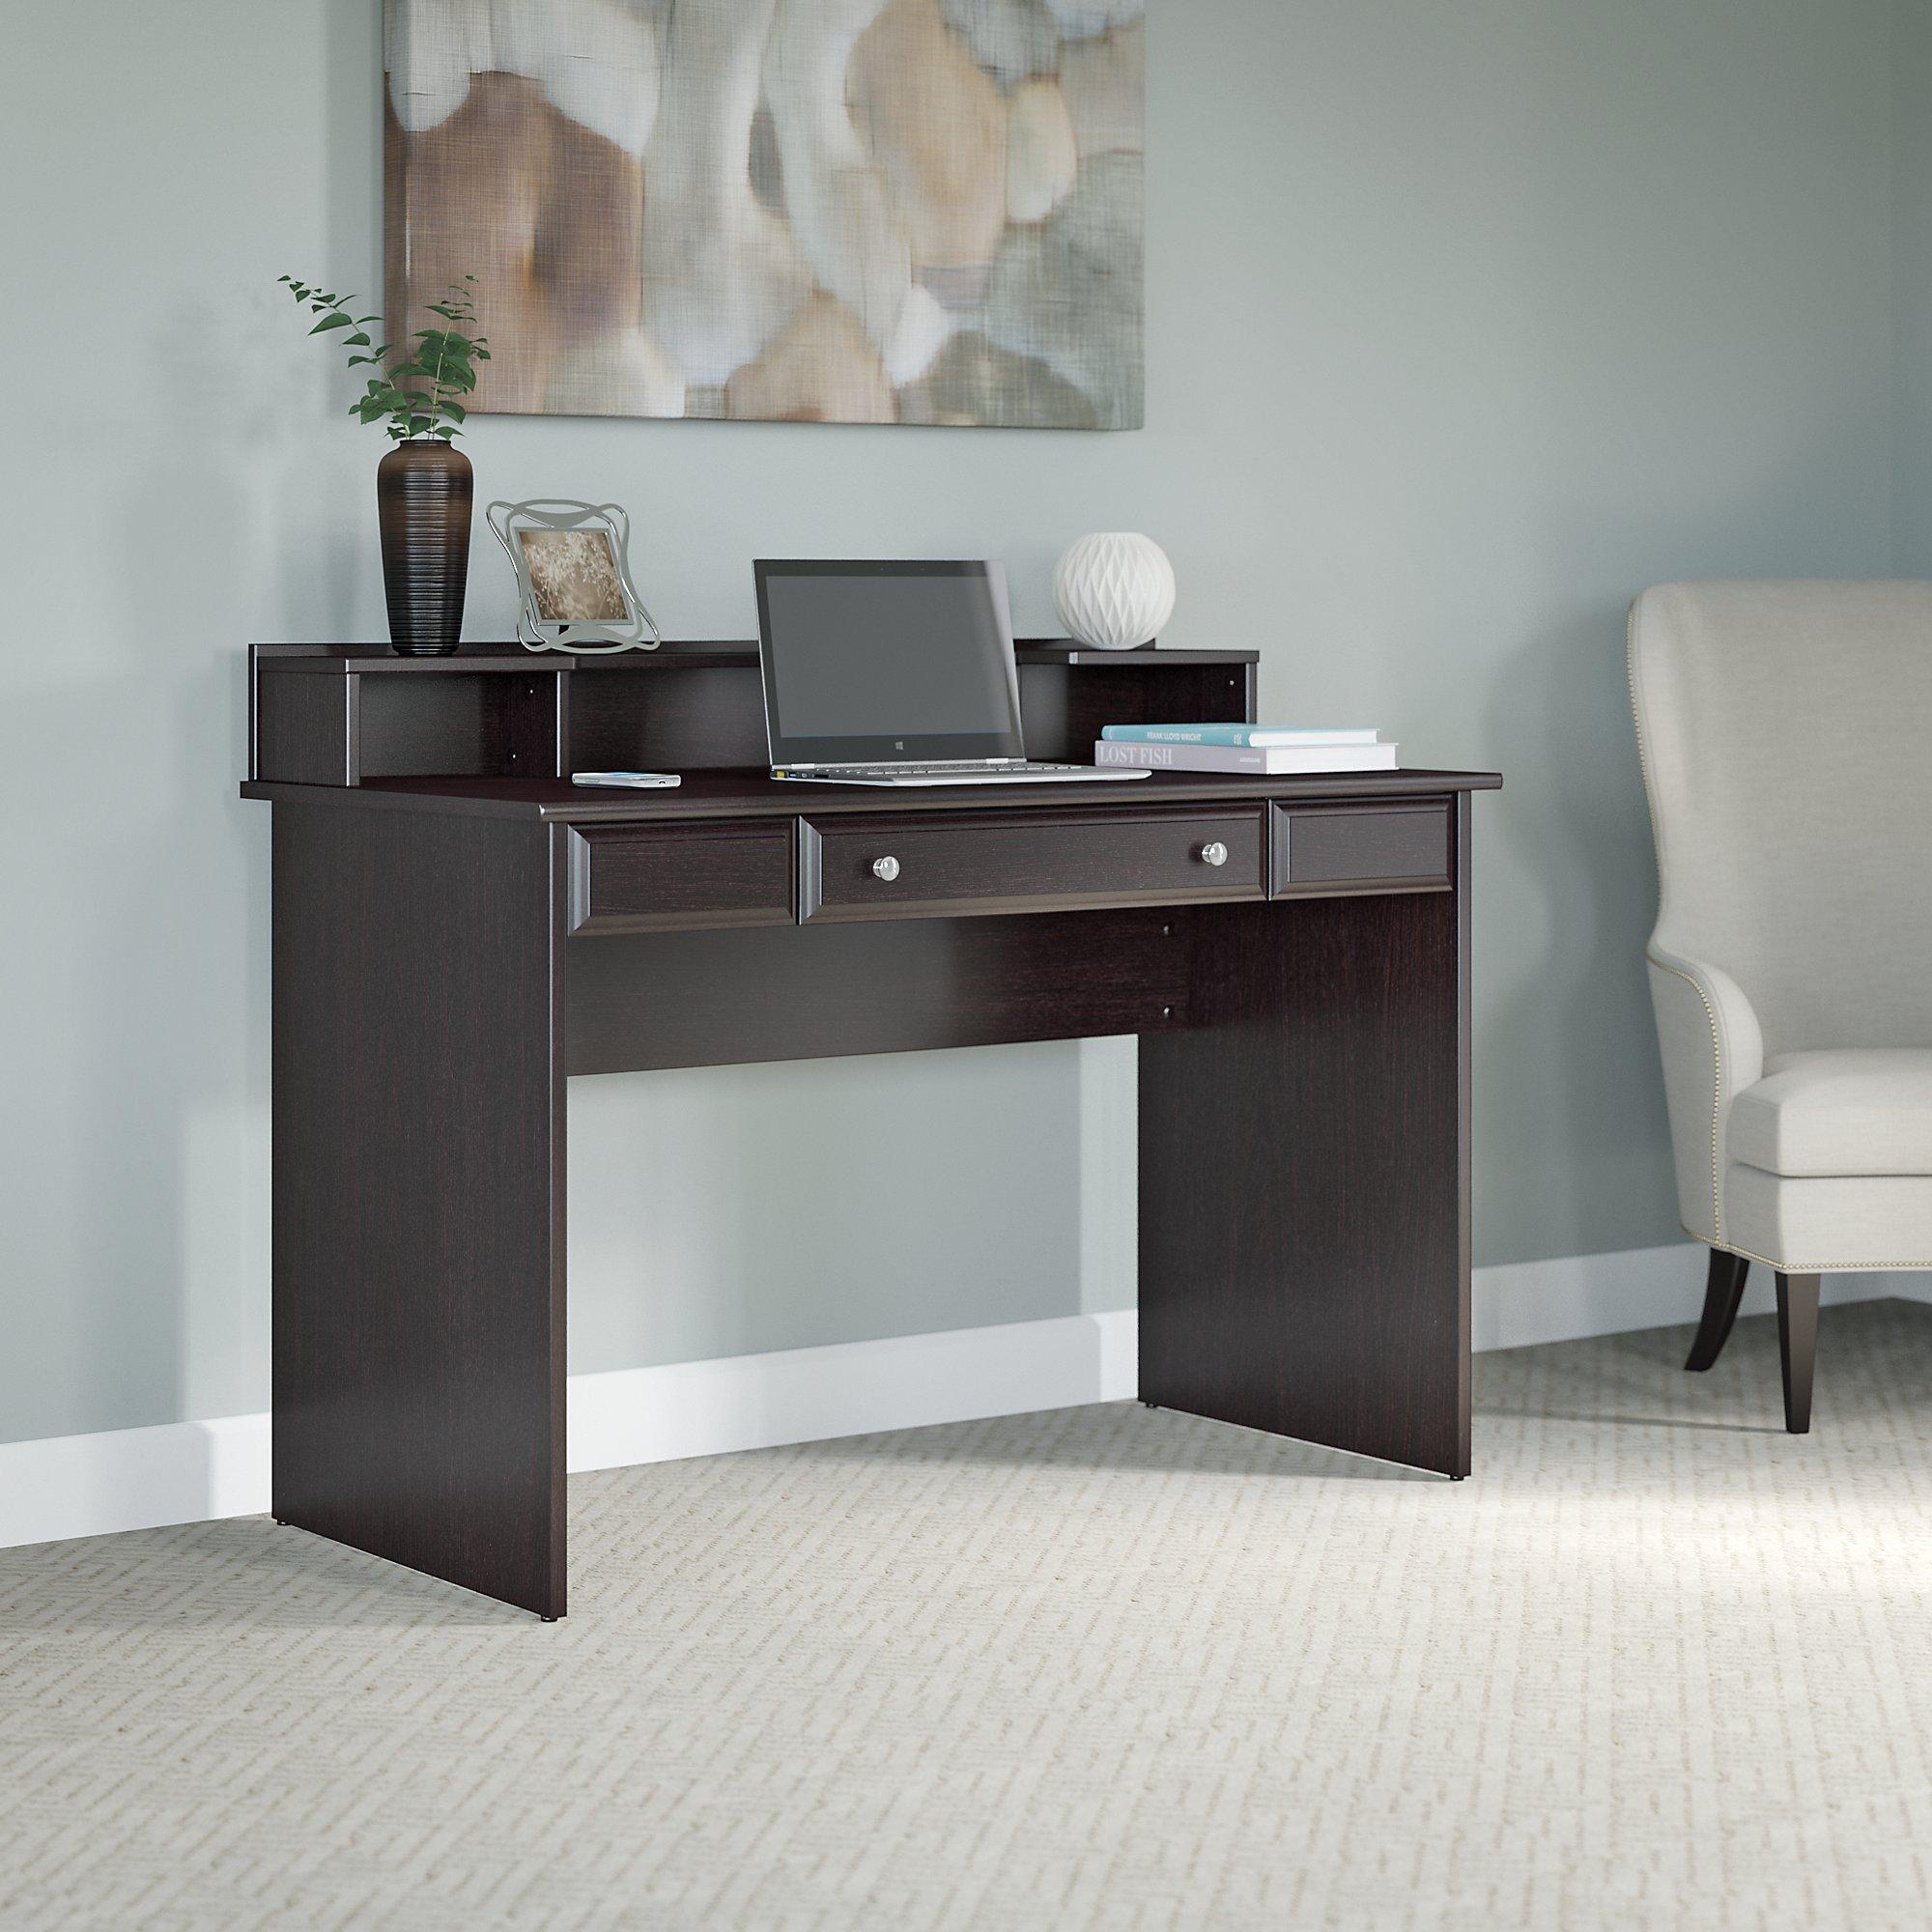 Bush Furniture Cabot Writing Desk with Desktop Organizer in Espresso Oak